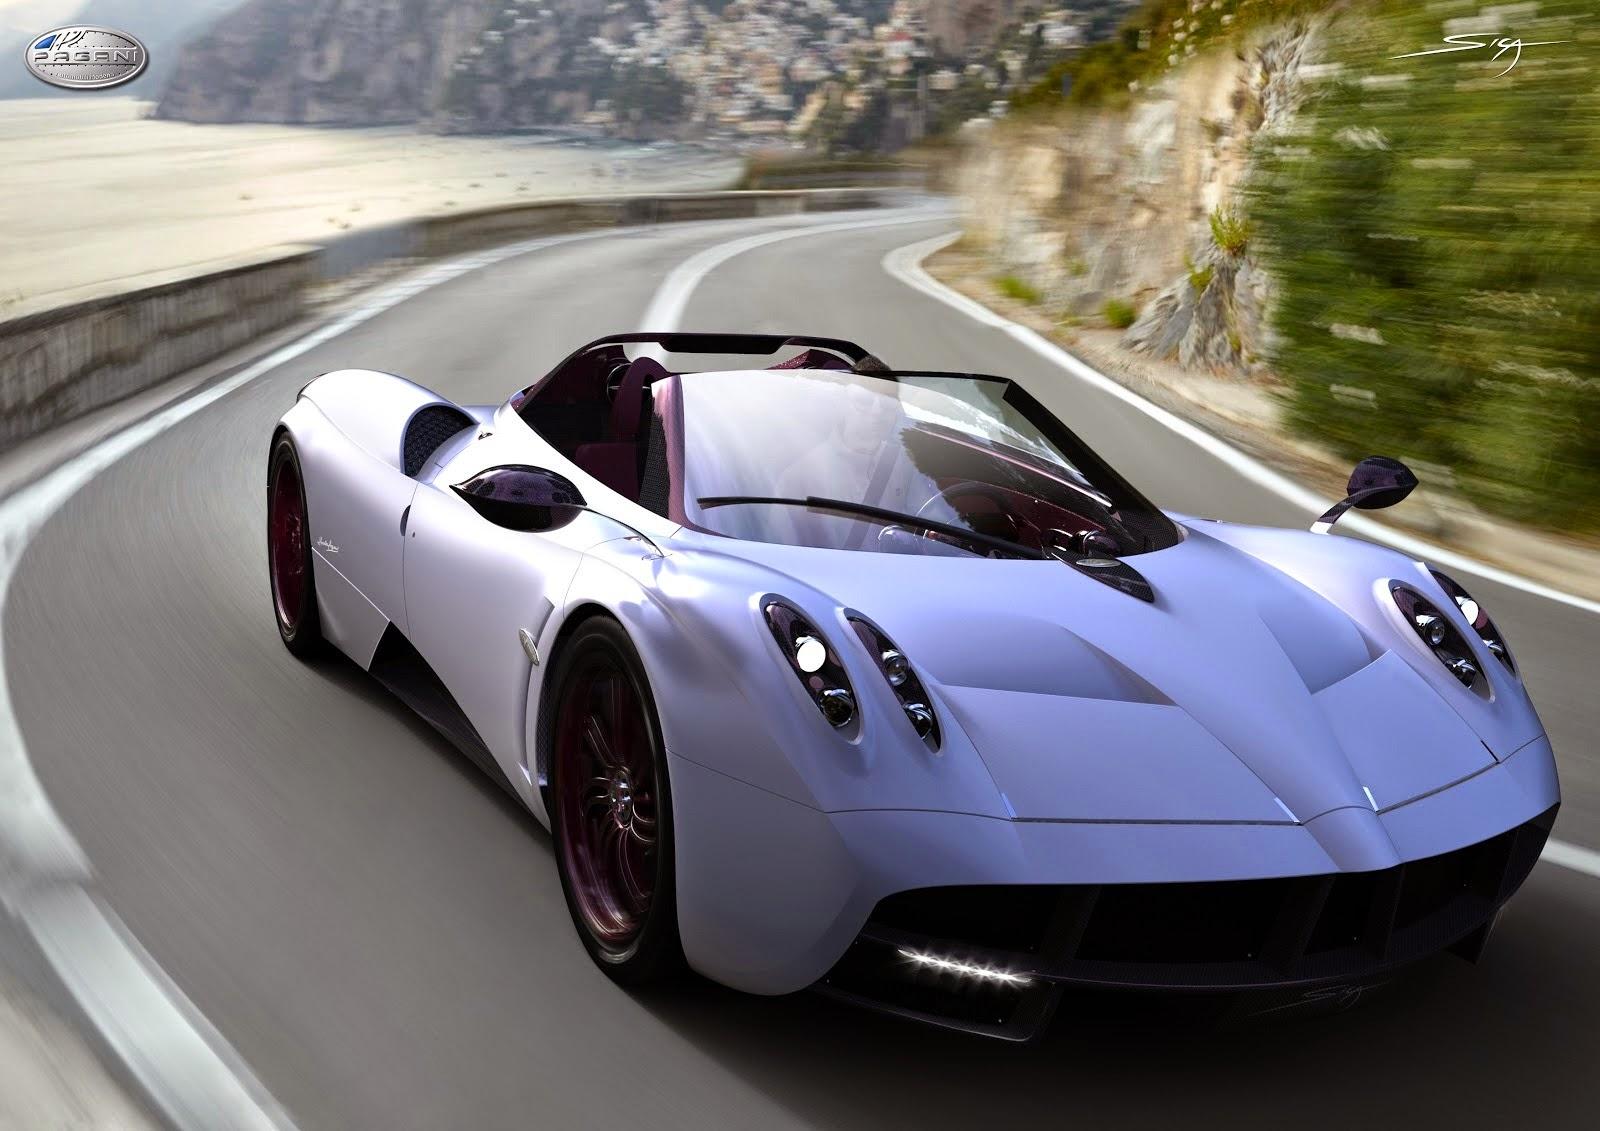 Pagani Huayra Roadster Slated To Debut Early 2016 At Geneva Motor Show Carscoops